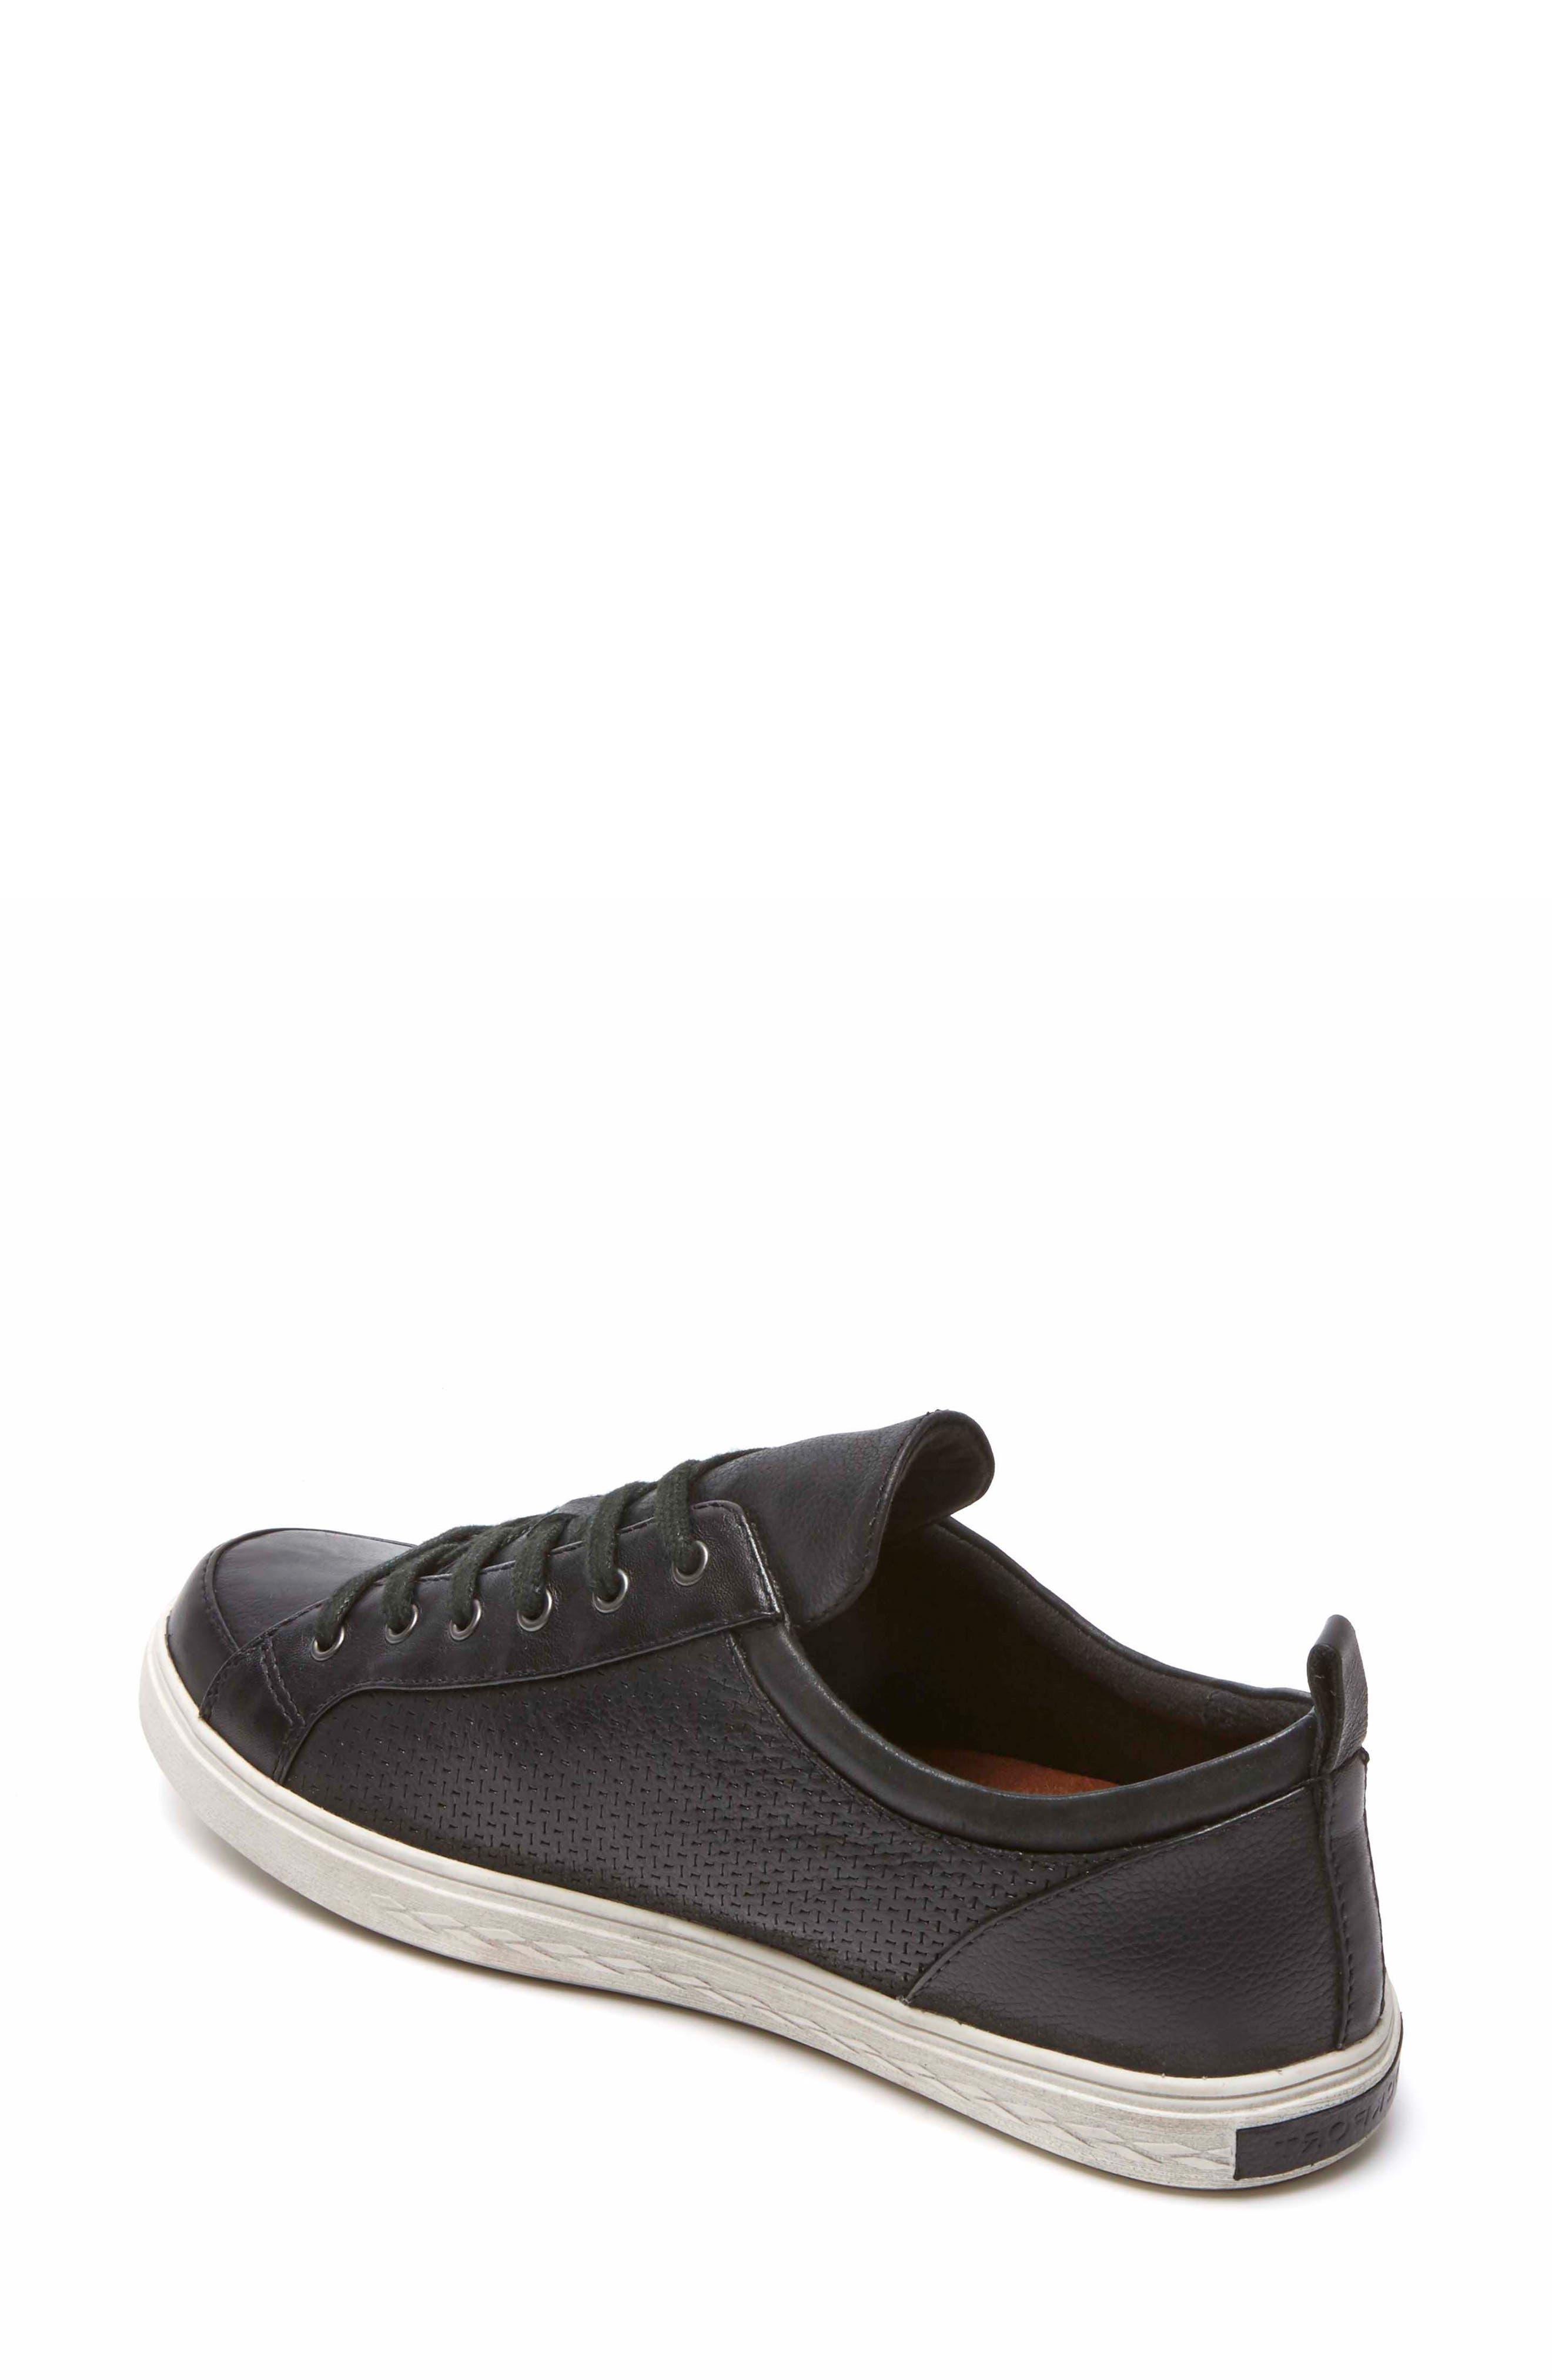 Willa Sneaker,                             Alternate thumbnail 2, color,                             BLACK LEATHER